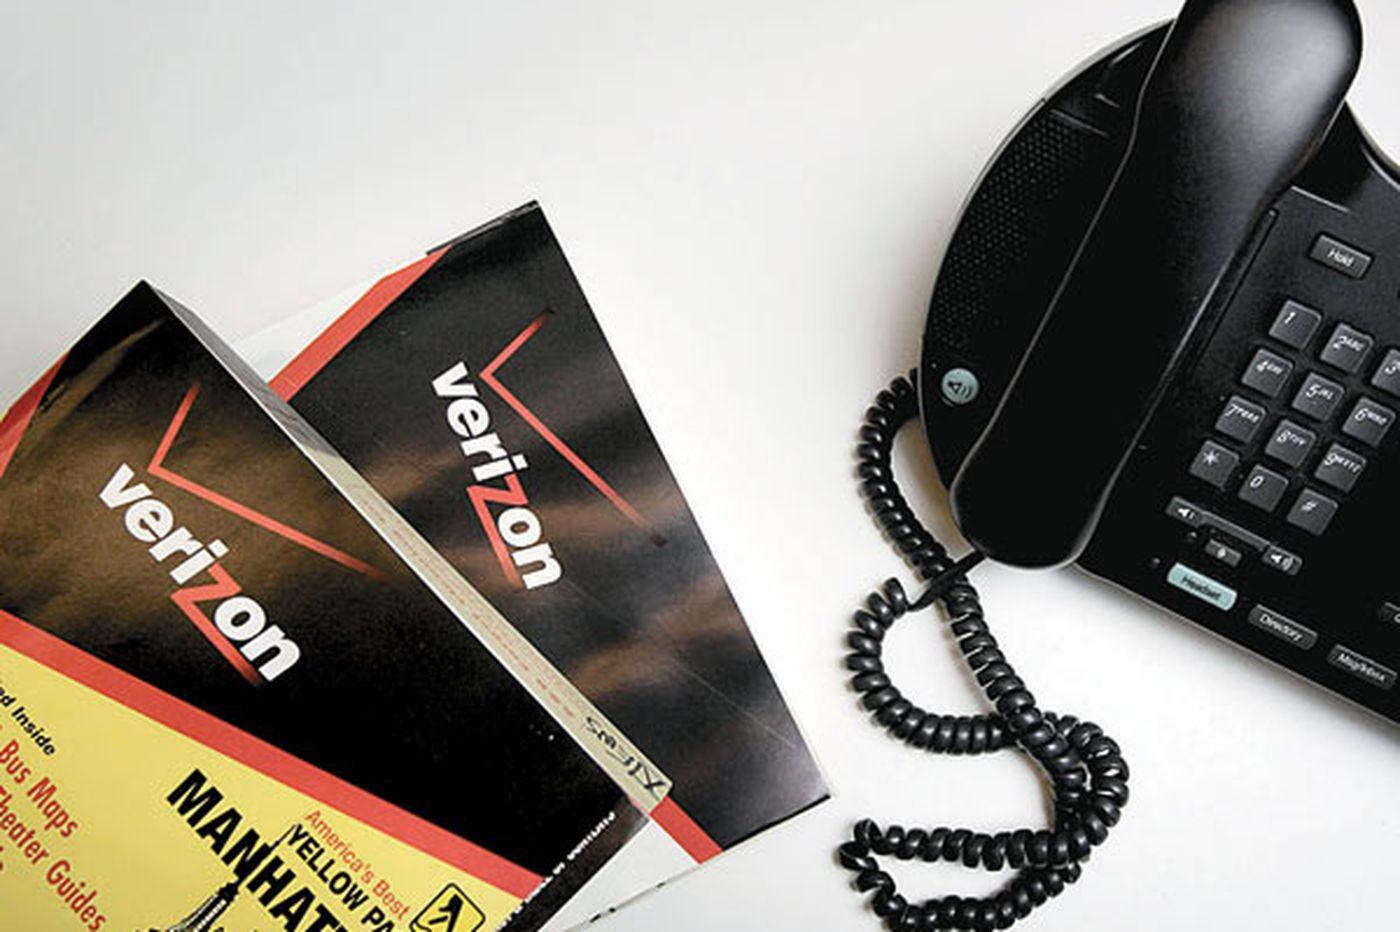 PUC deregulates Verizon landline service in Phila. area